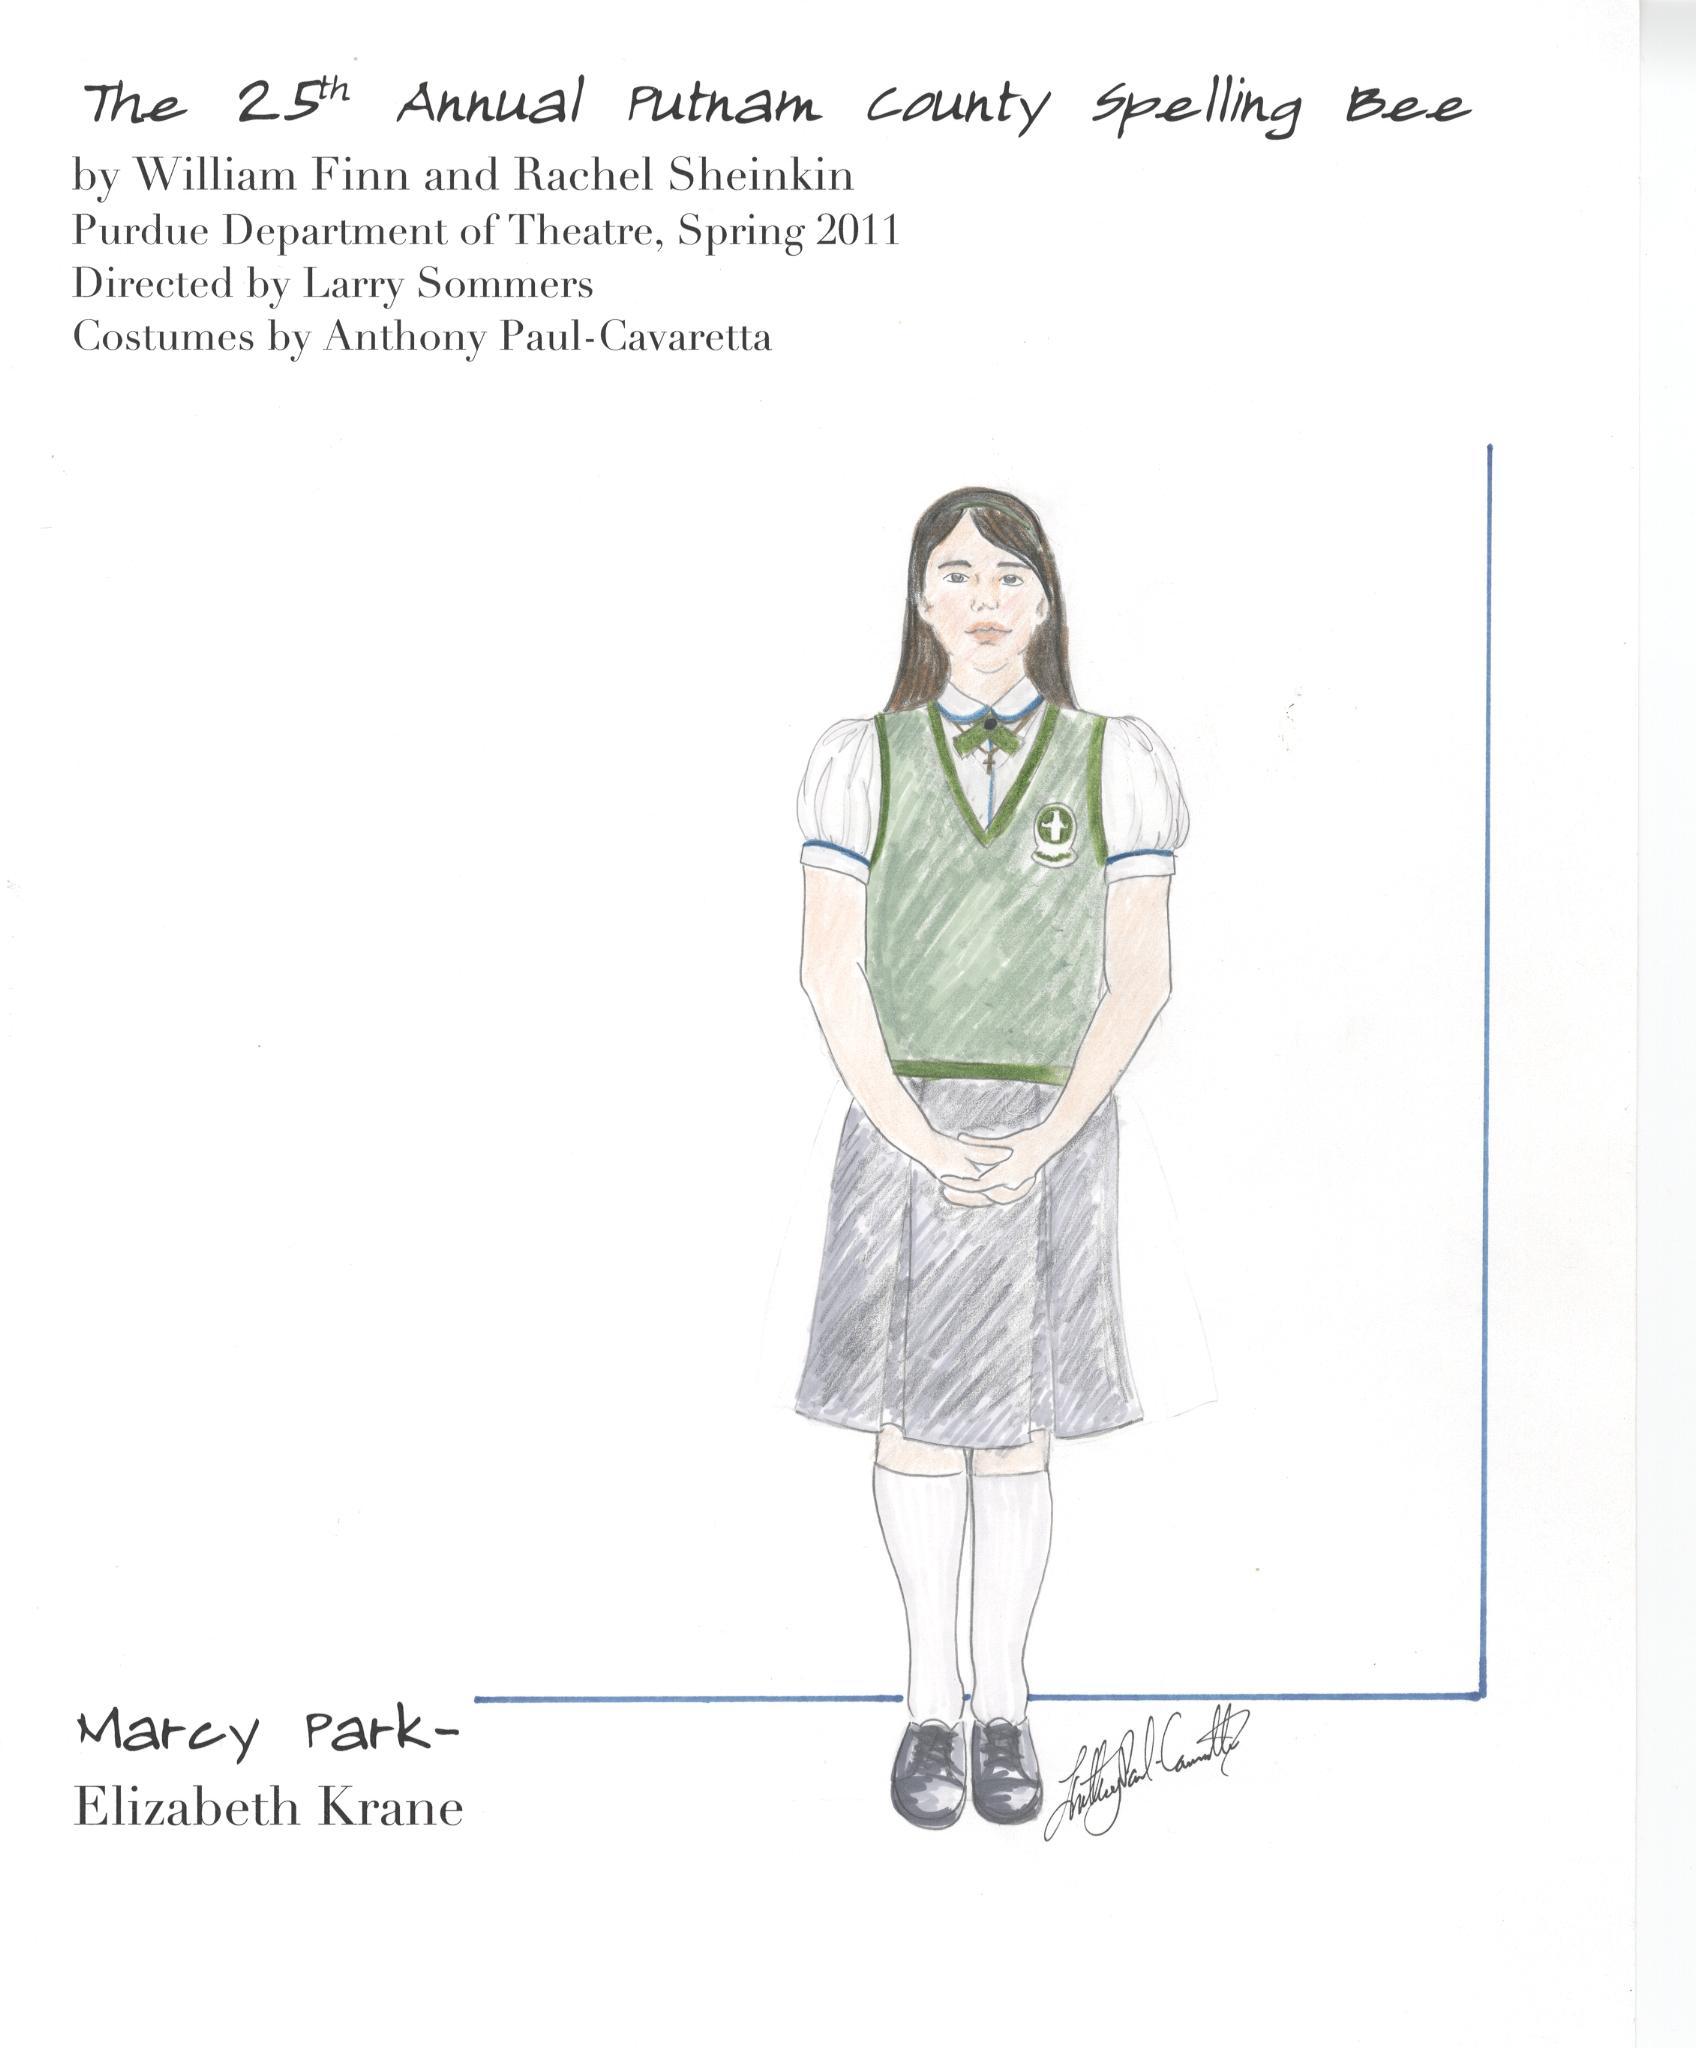 Marcy Park.jpg